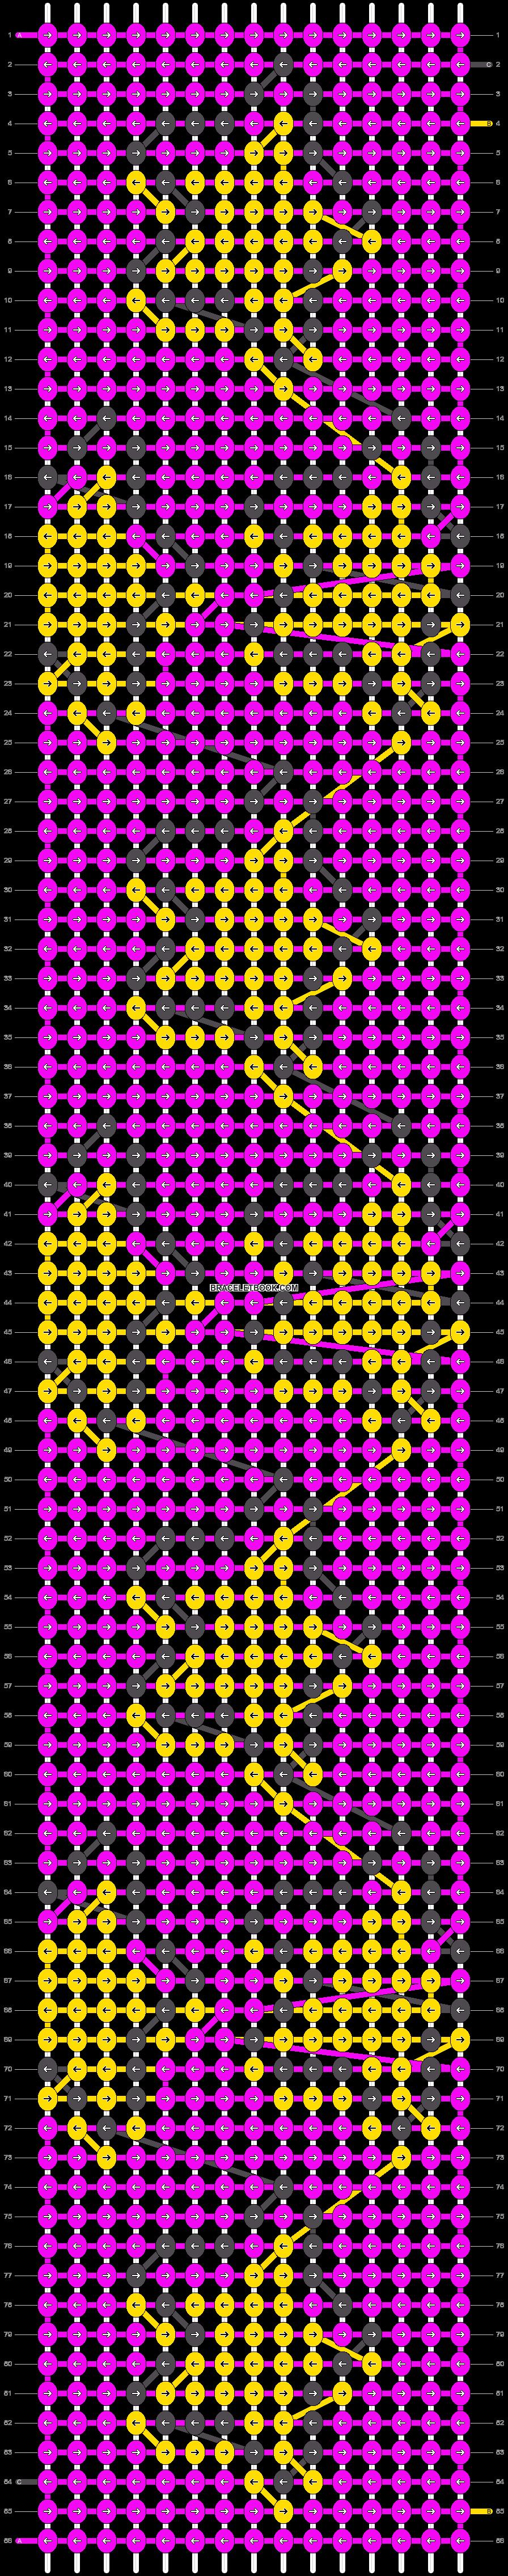 Alpha pattern #80555 variation #150735 pattern